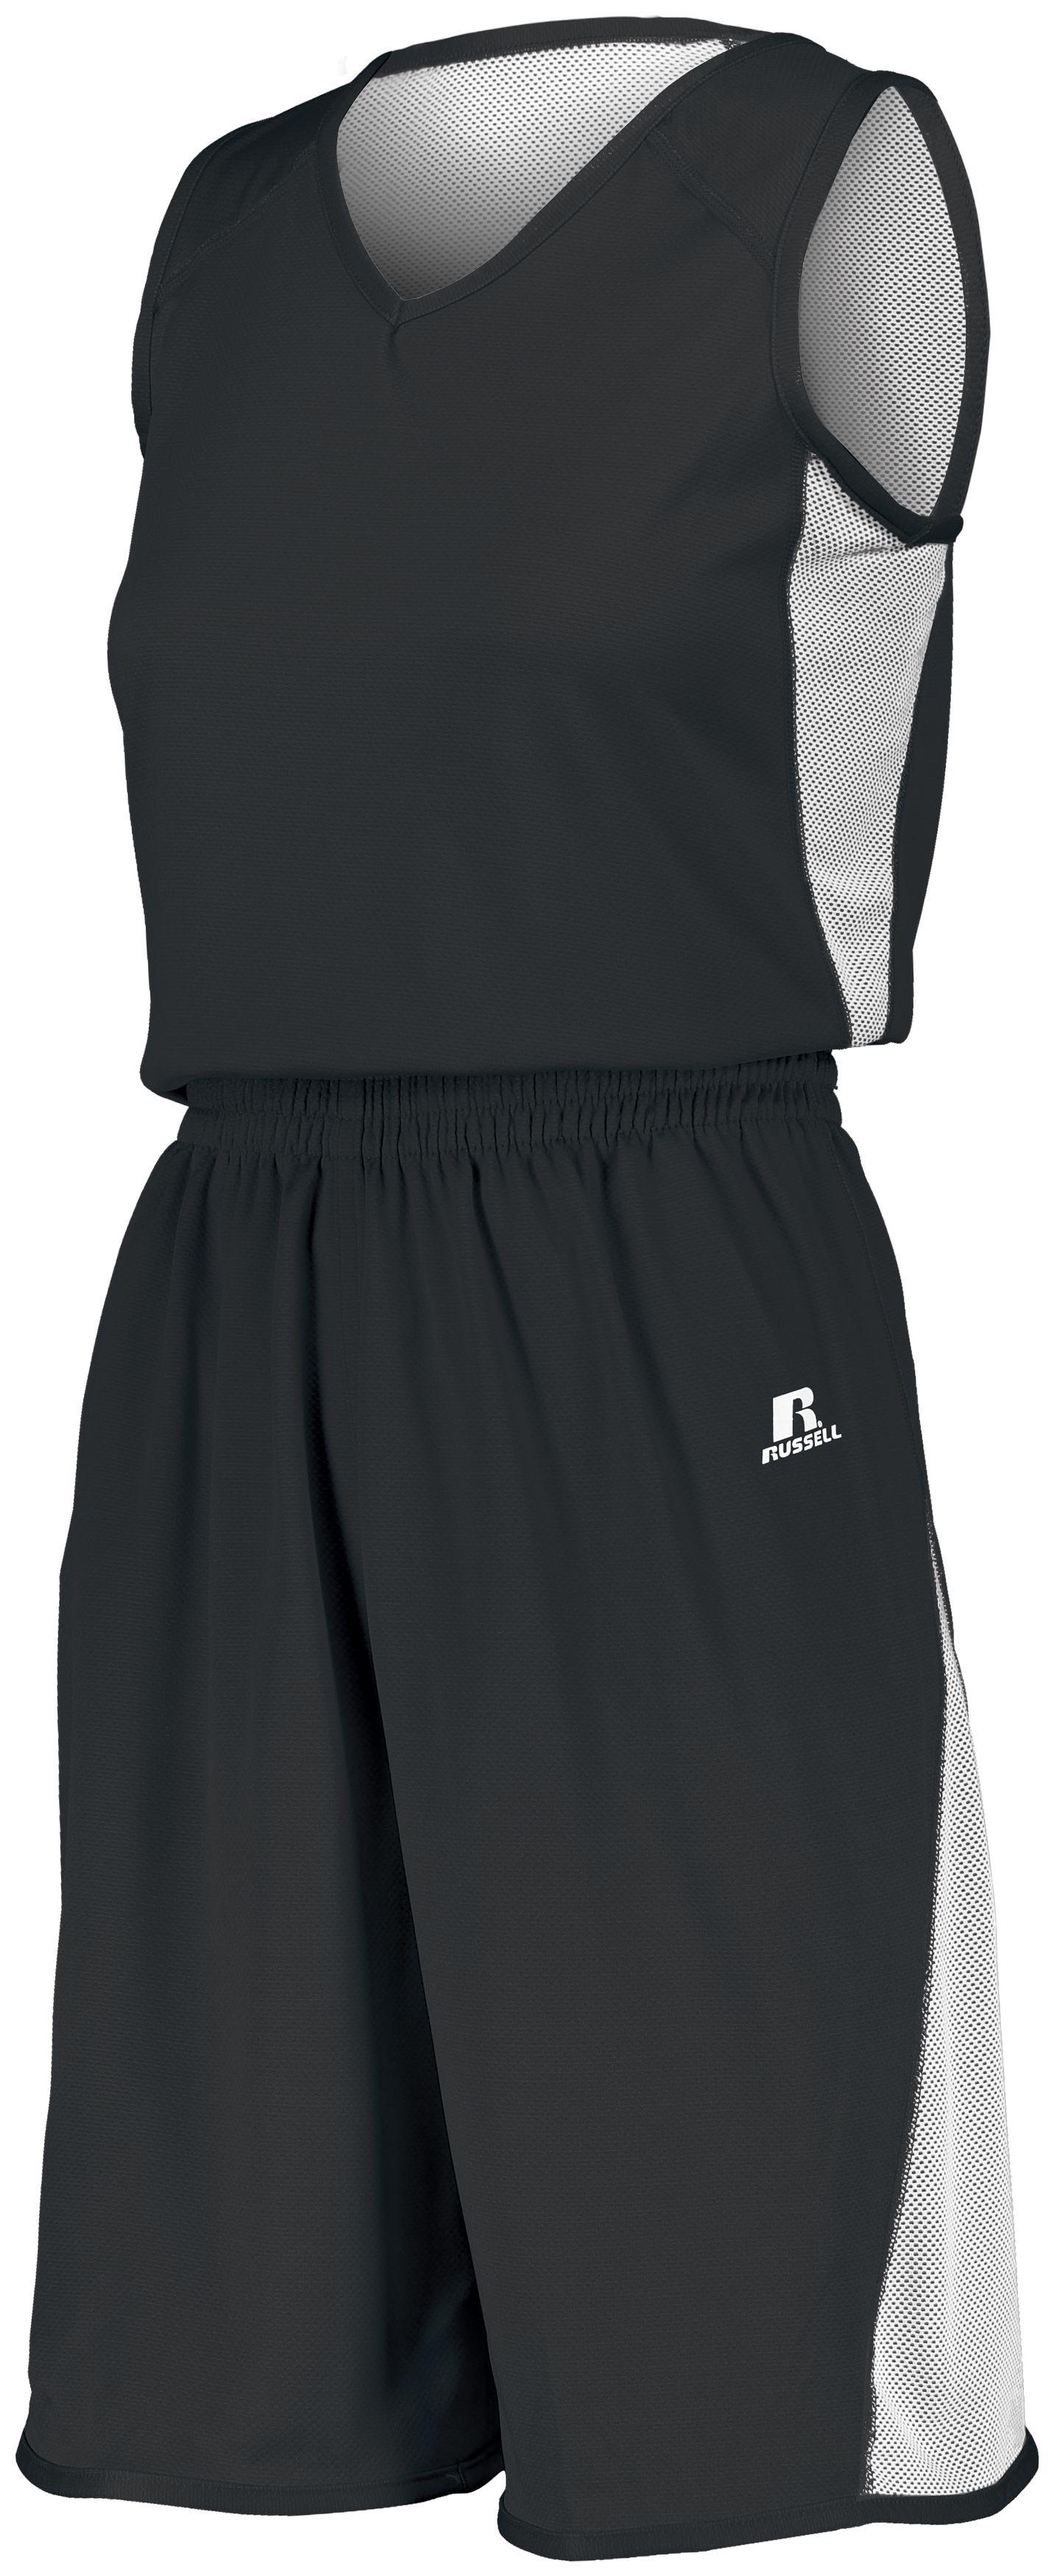 Ladies Undivided Single Ply Reversible Shorts - BLACK/WHITE